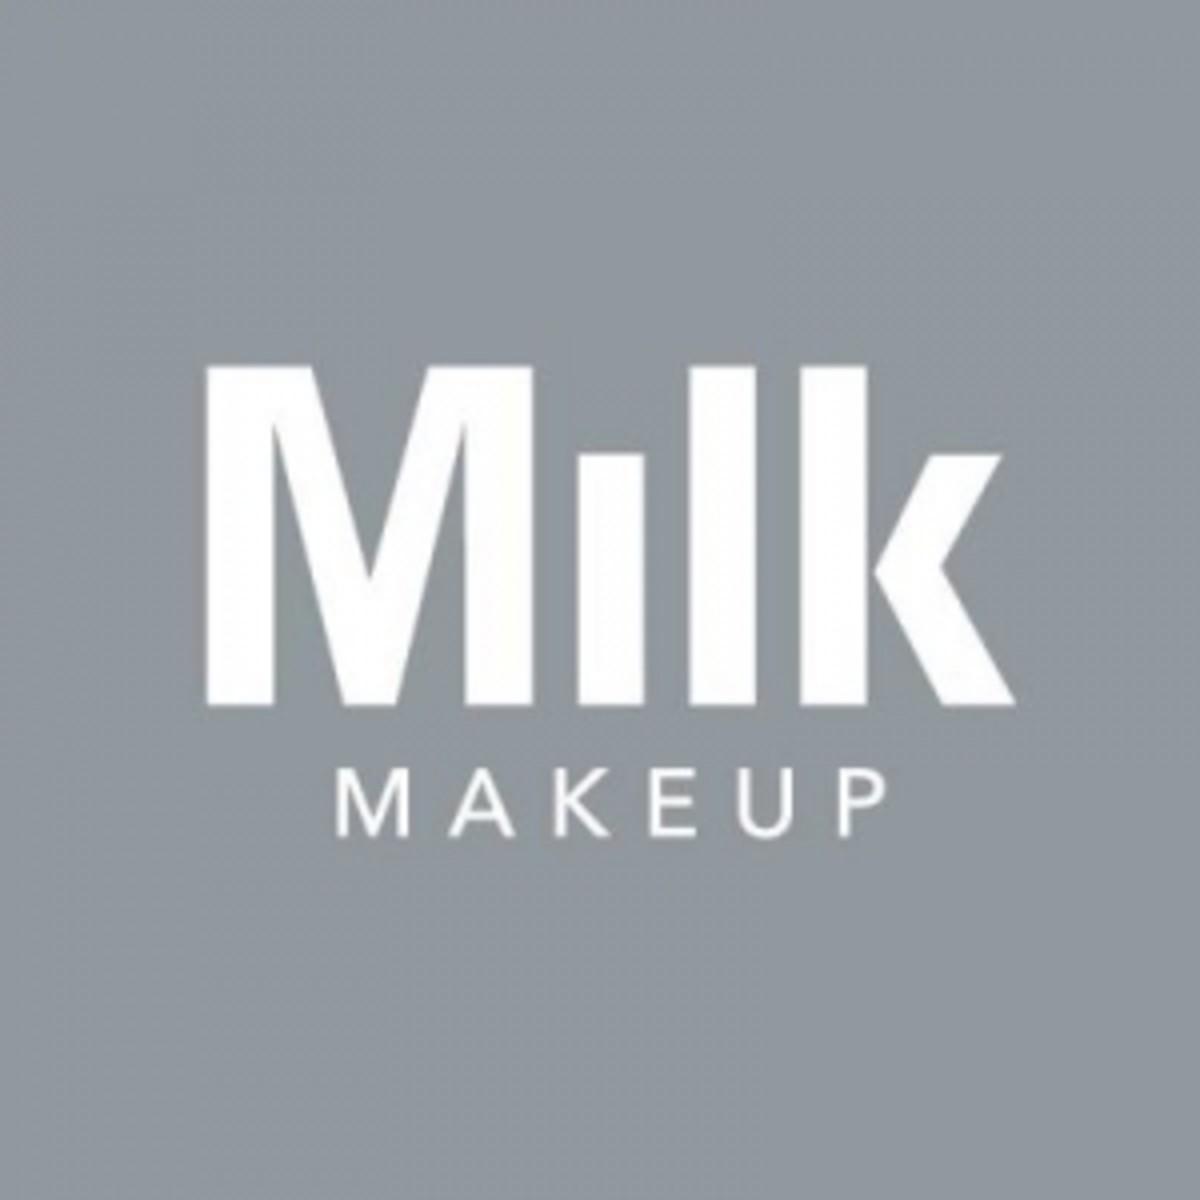 milk-makeup-455fed7d32e040b2166ae43637a0ee8a-300.jpg